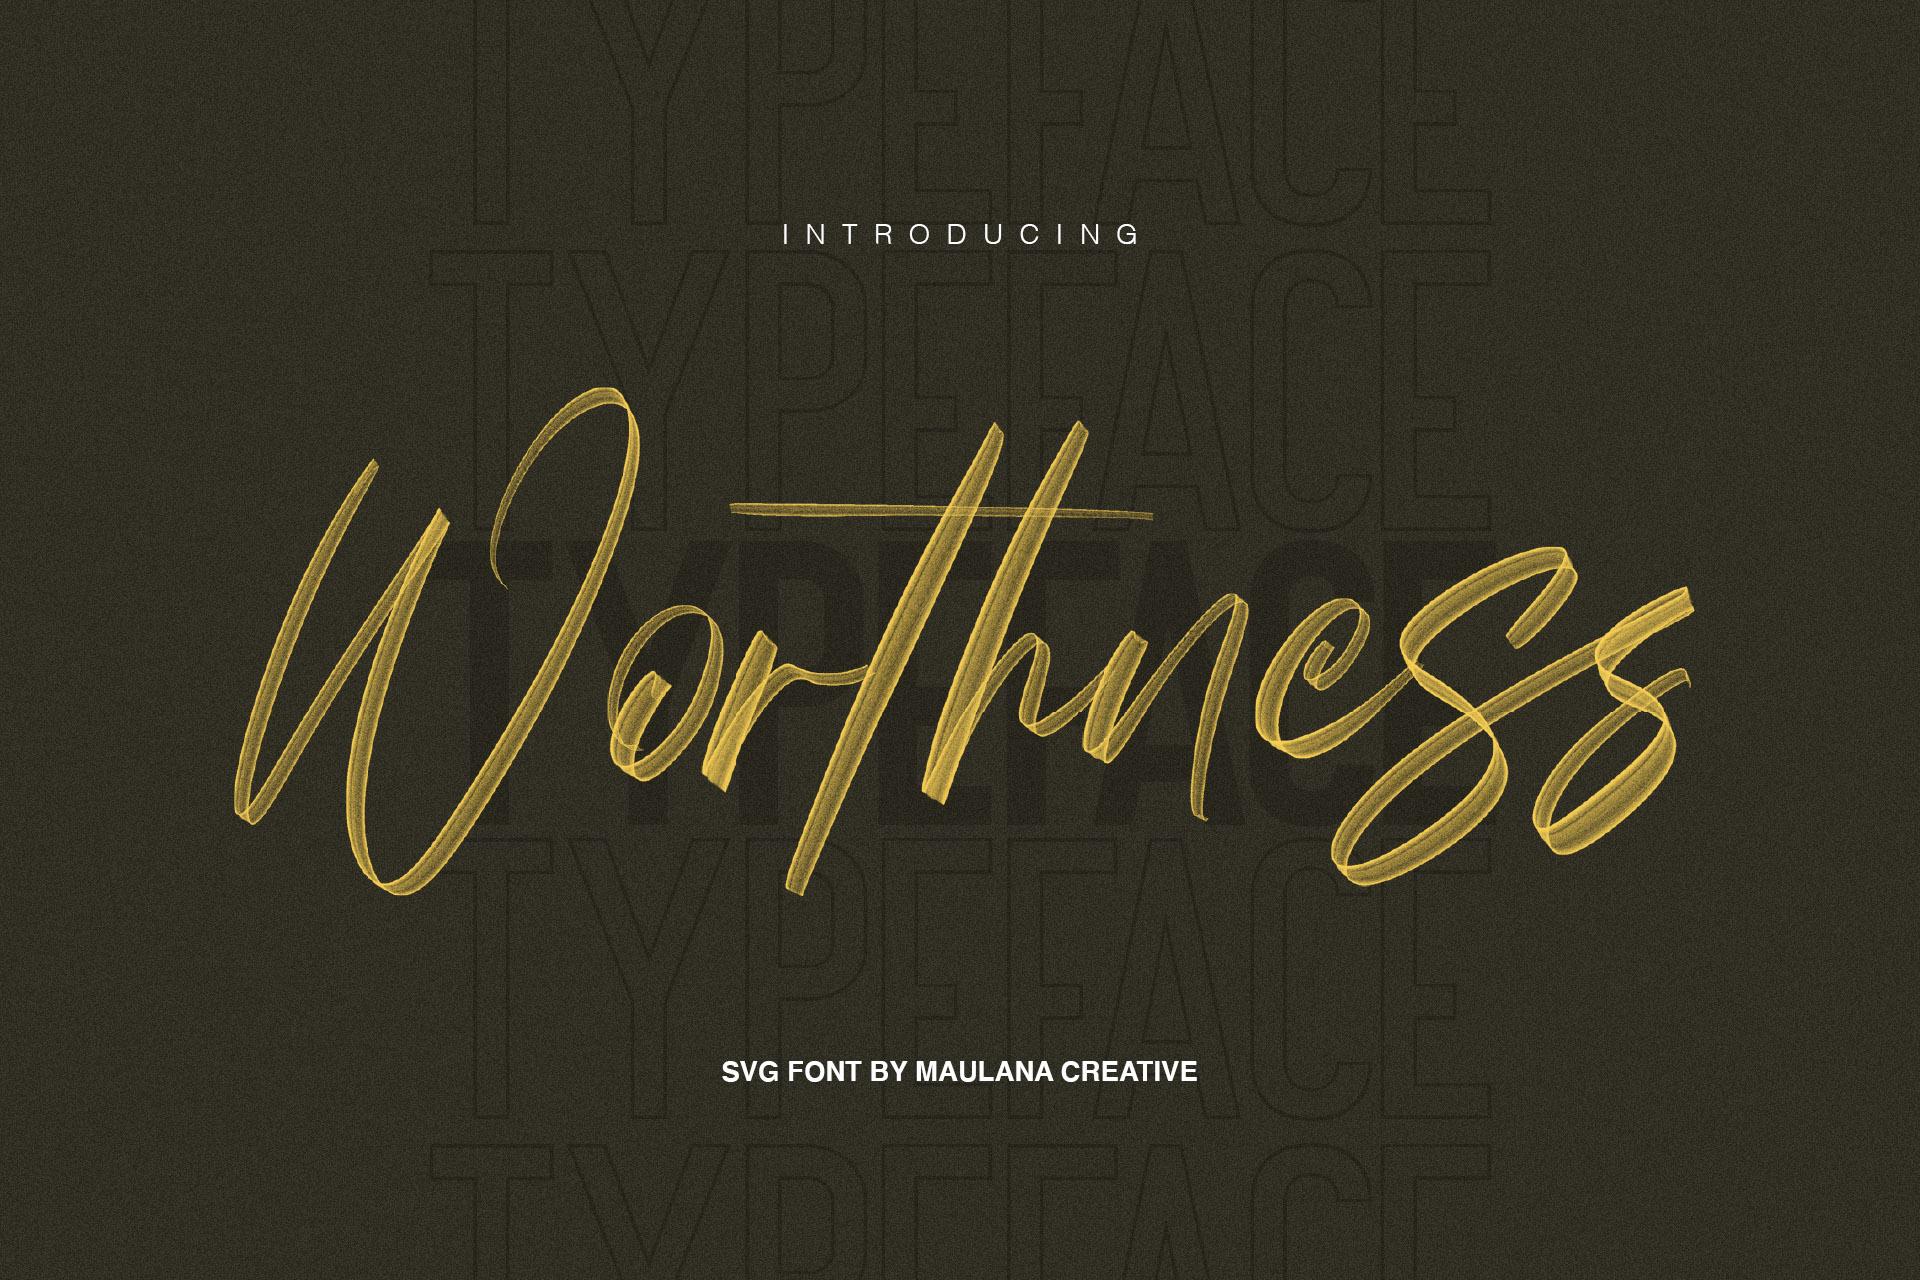 Worthness SVG Brush Font Free Sans example image 1